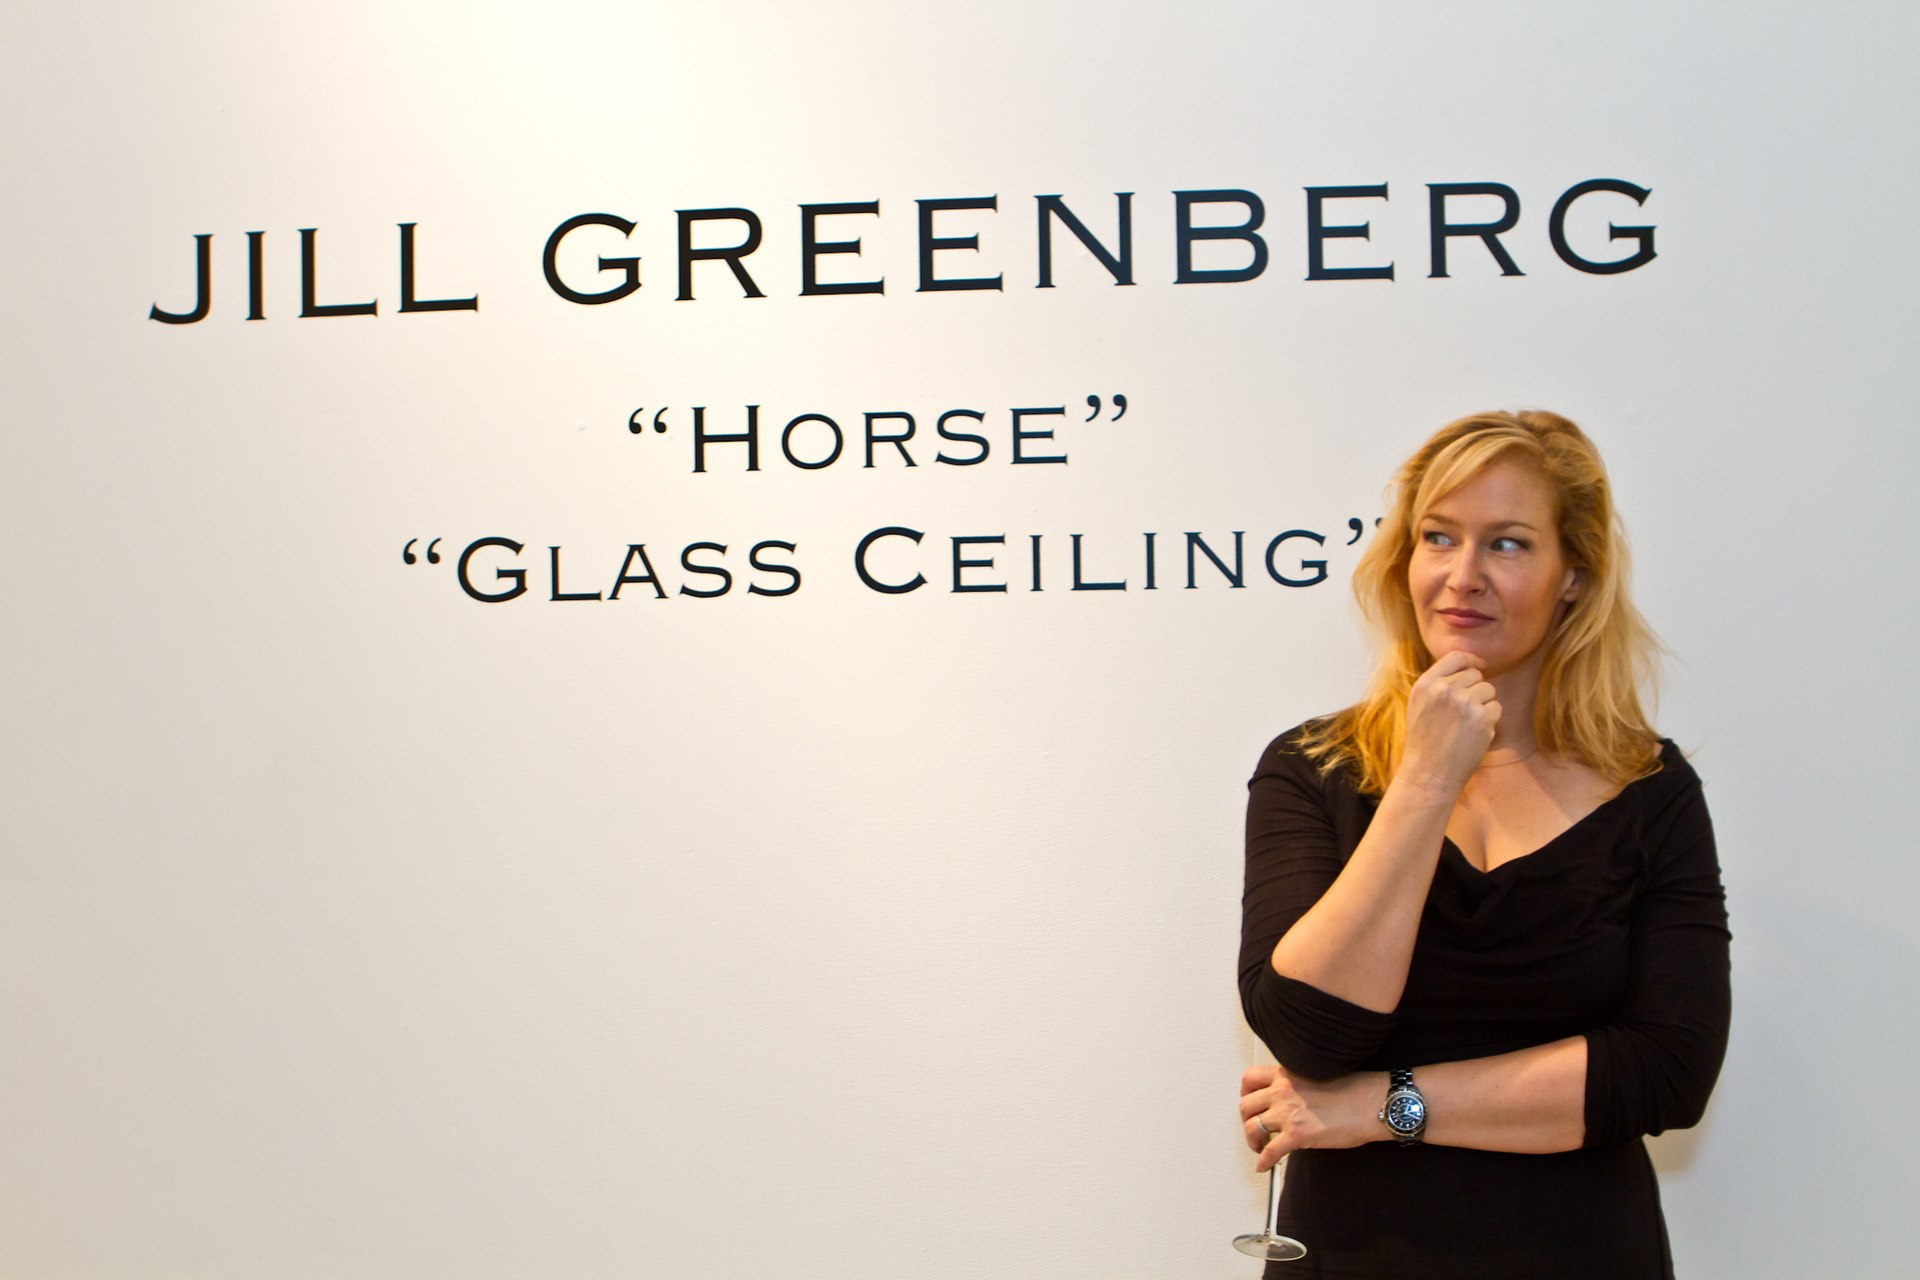 Jill Greenberg - Wikip... Arnold Schwarzenegger